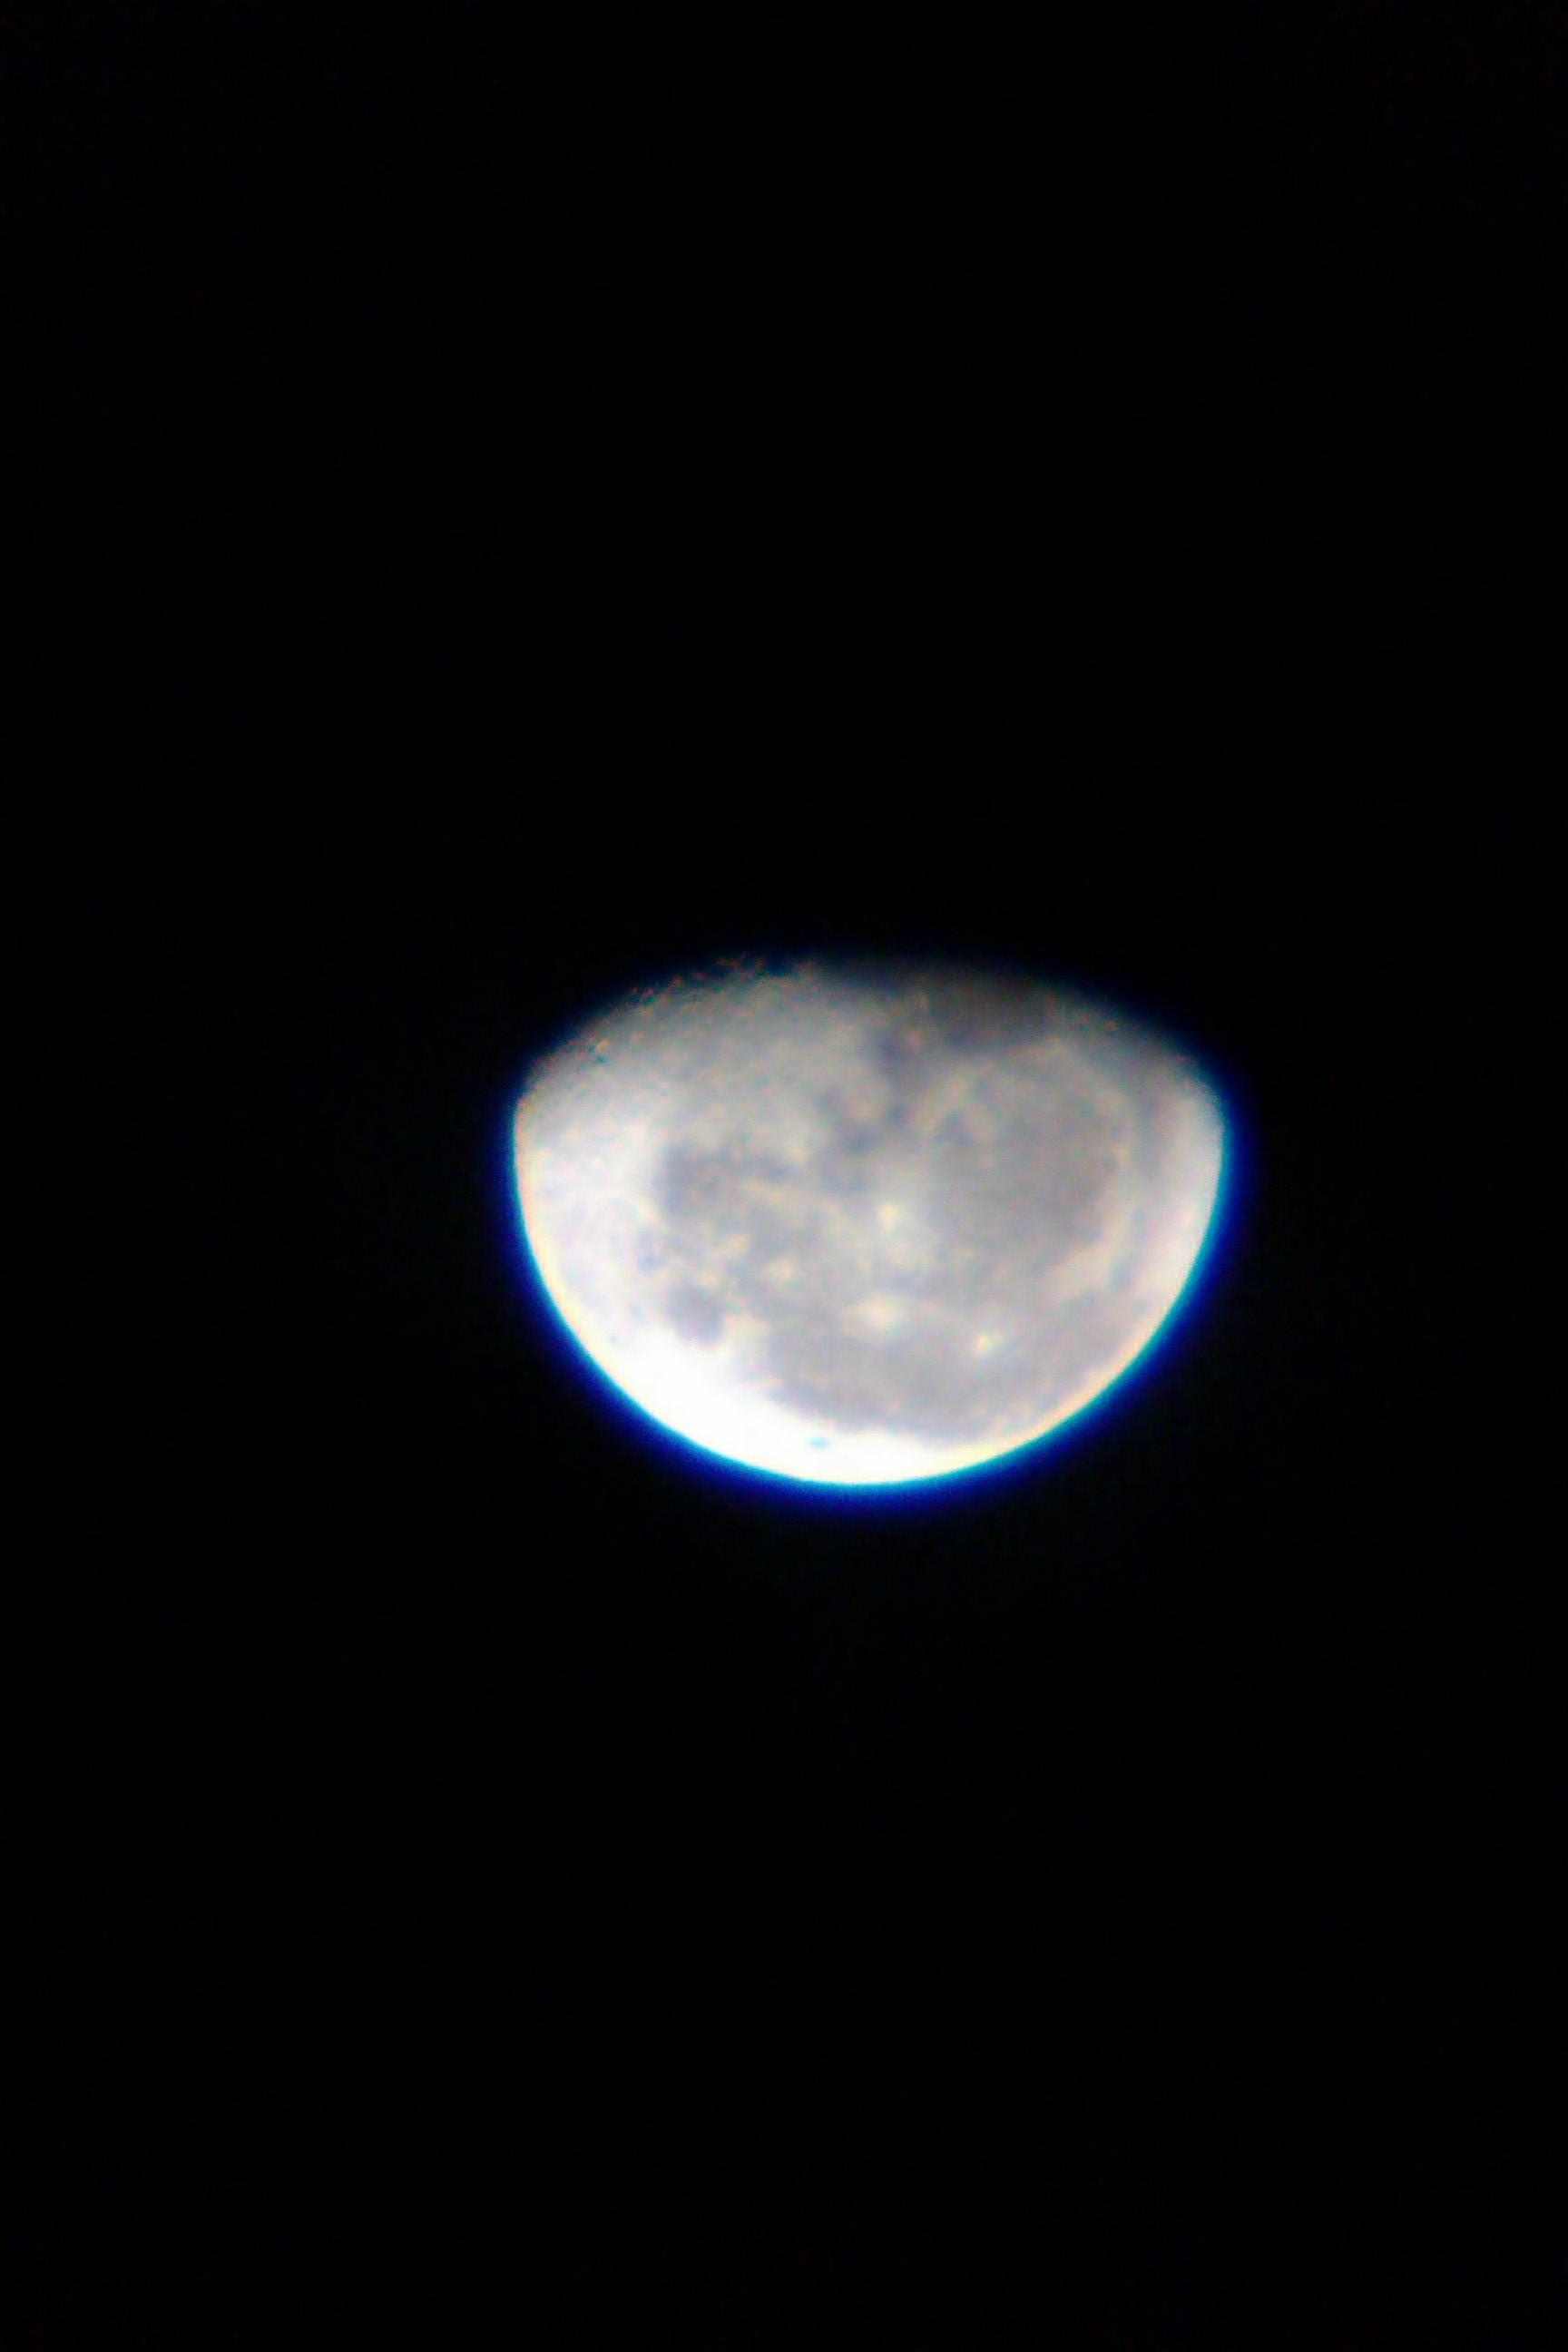 myblog.9e.cz/teleskop/M3.jpg